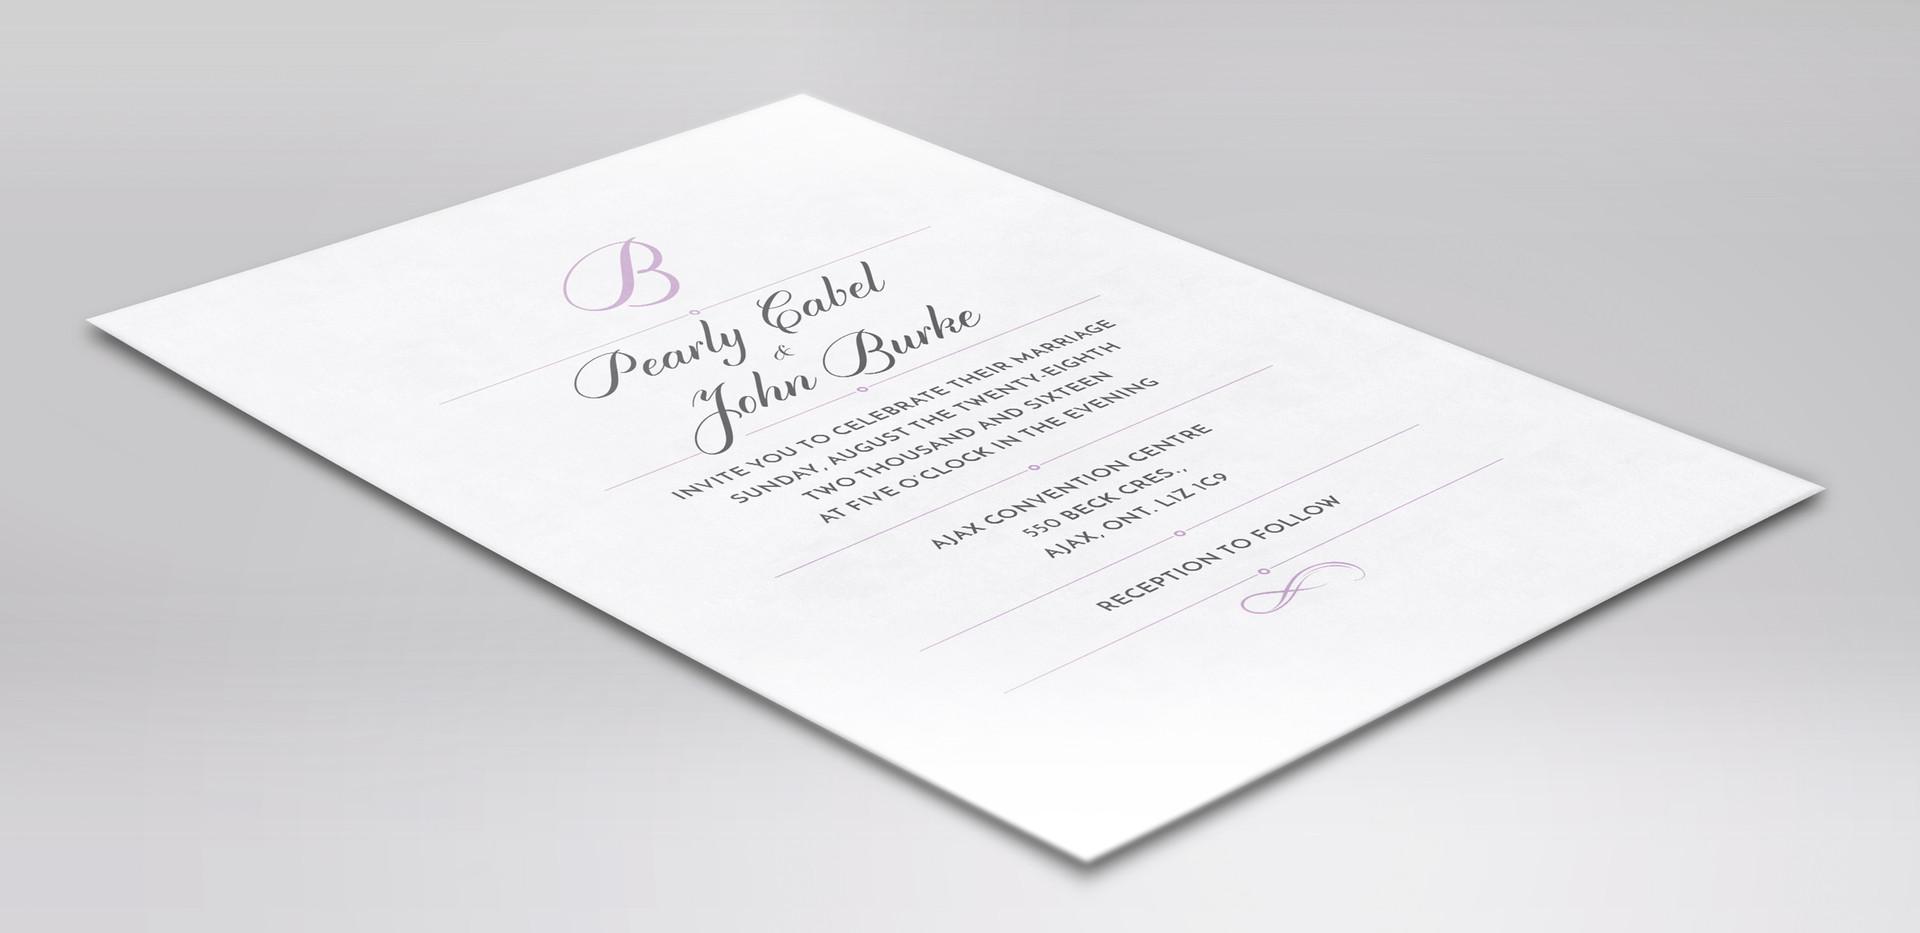 OurWork-Invitation-Pearly&John-Full.jpg